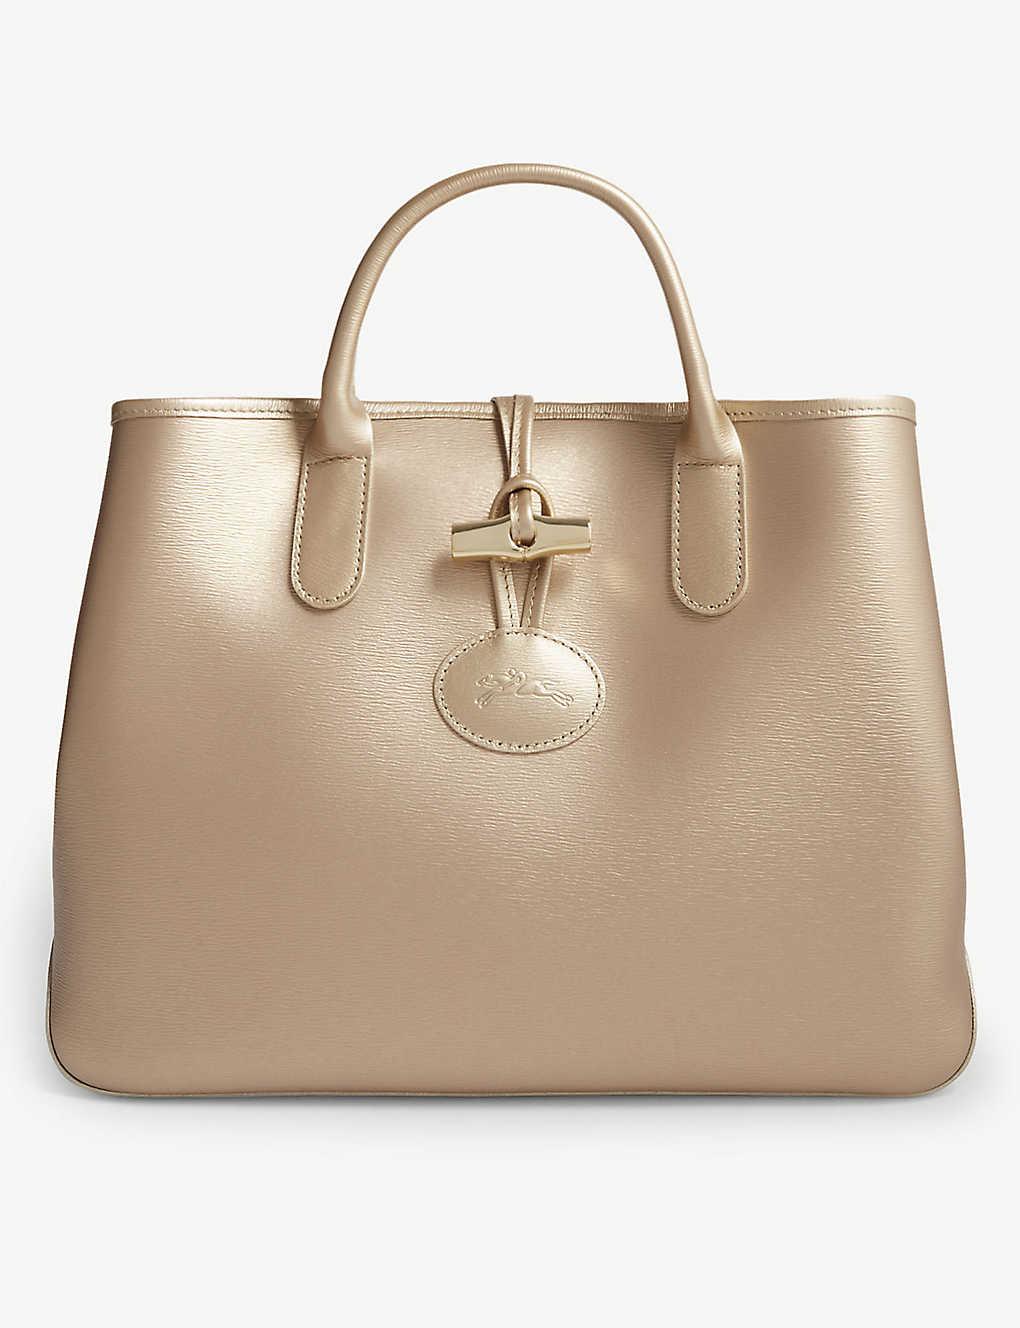 337a22026aa LONGCHAMP - Roseau medium metallic leather tote bag | Selfridges.com